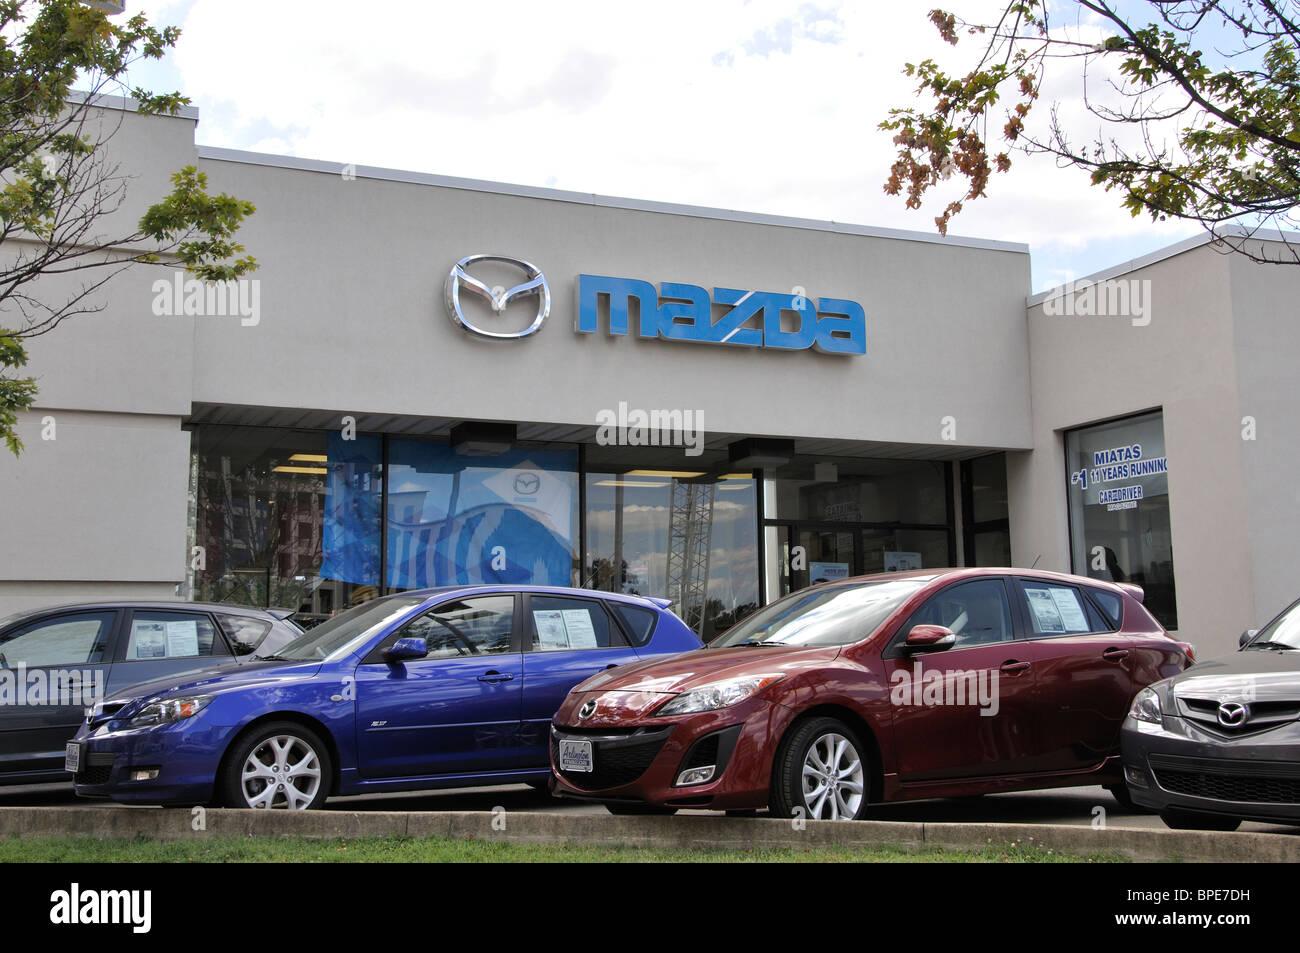 Mazda Dealership Arlington VA USA Stock Photo Royalty Free - Mazda dealership virginia